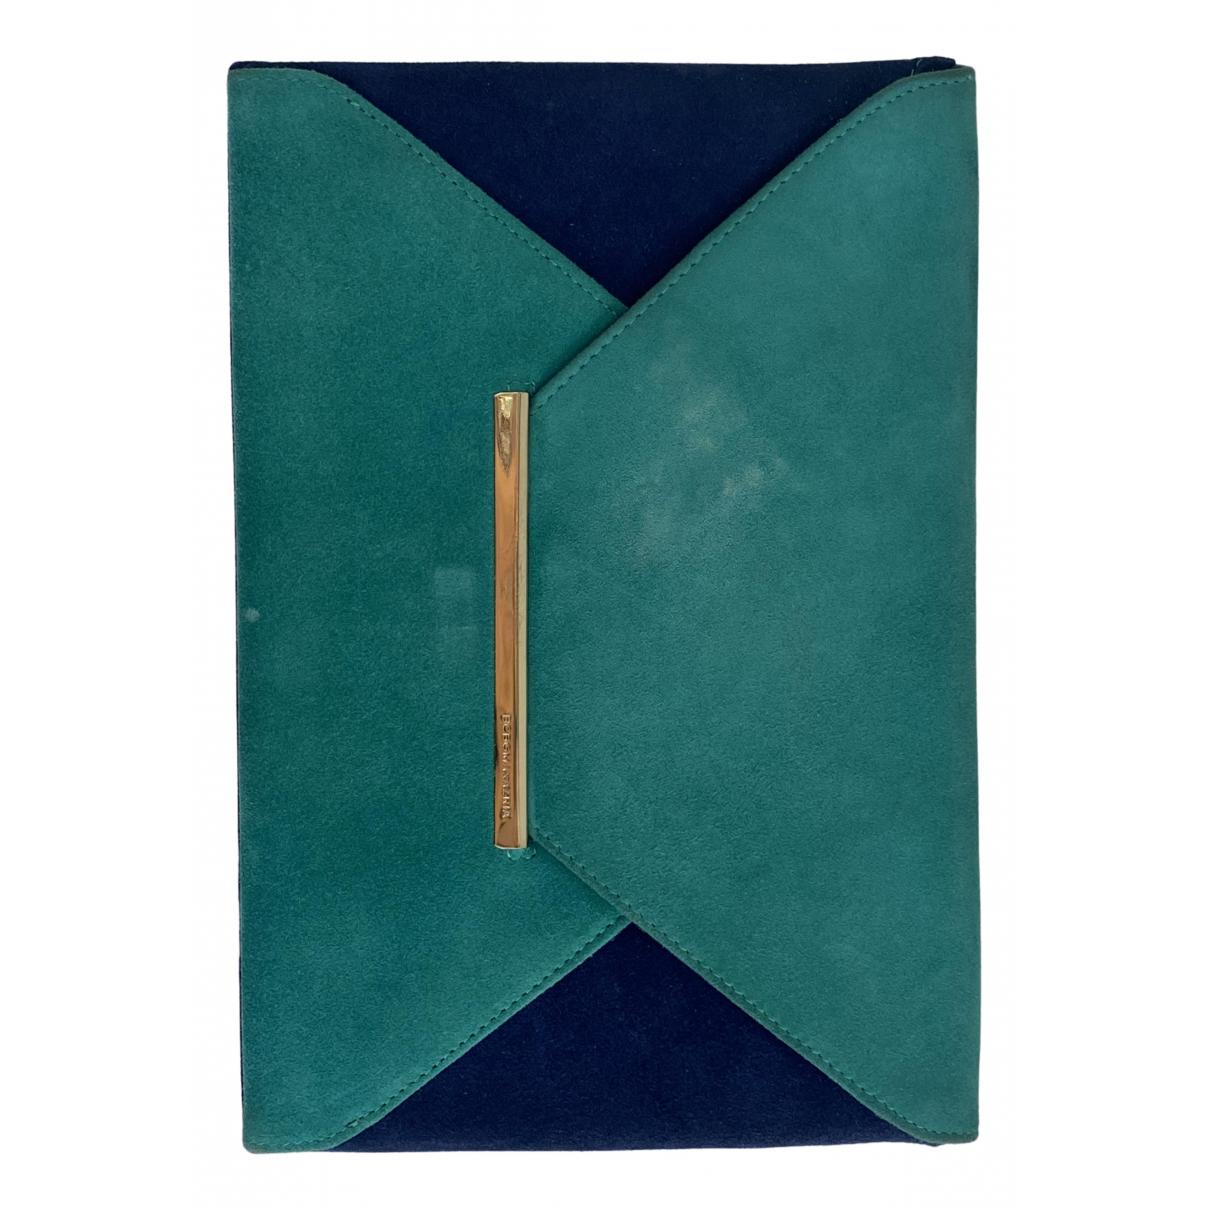 Bcbg Max Azria \N Clutch in  Blau Kunststoff